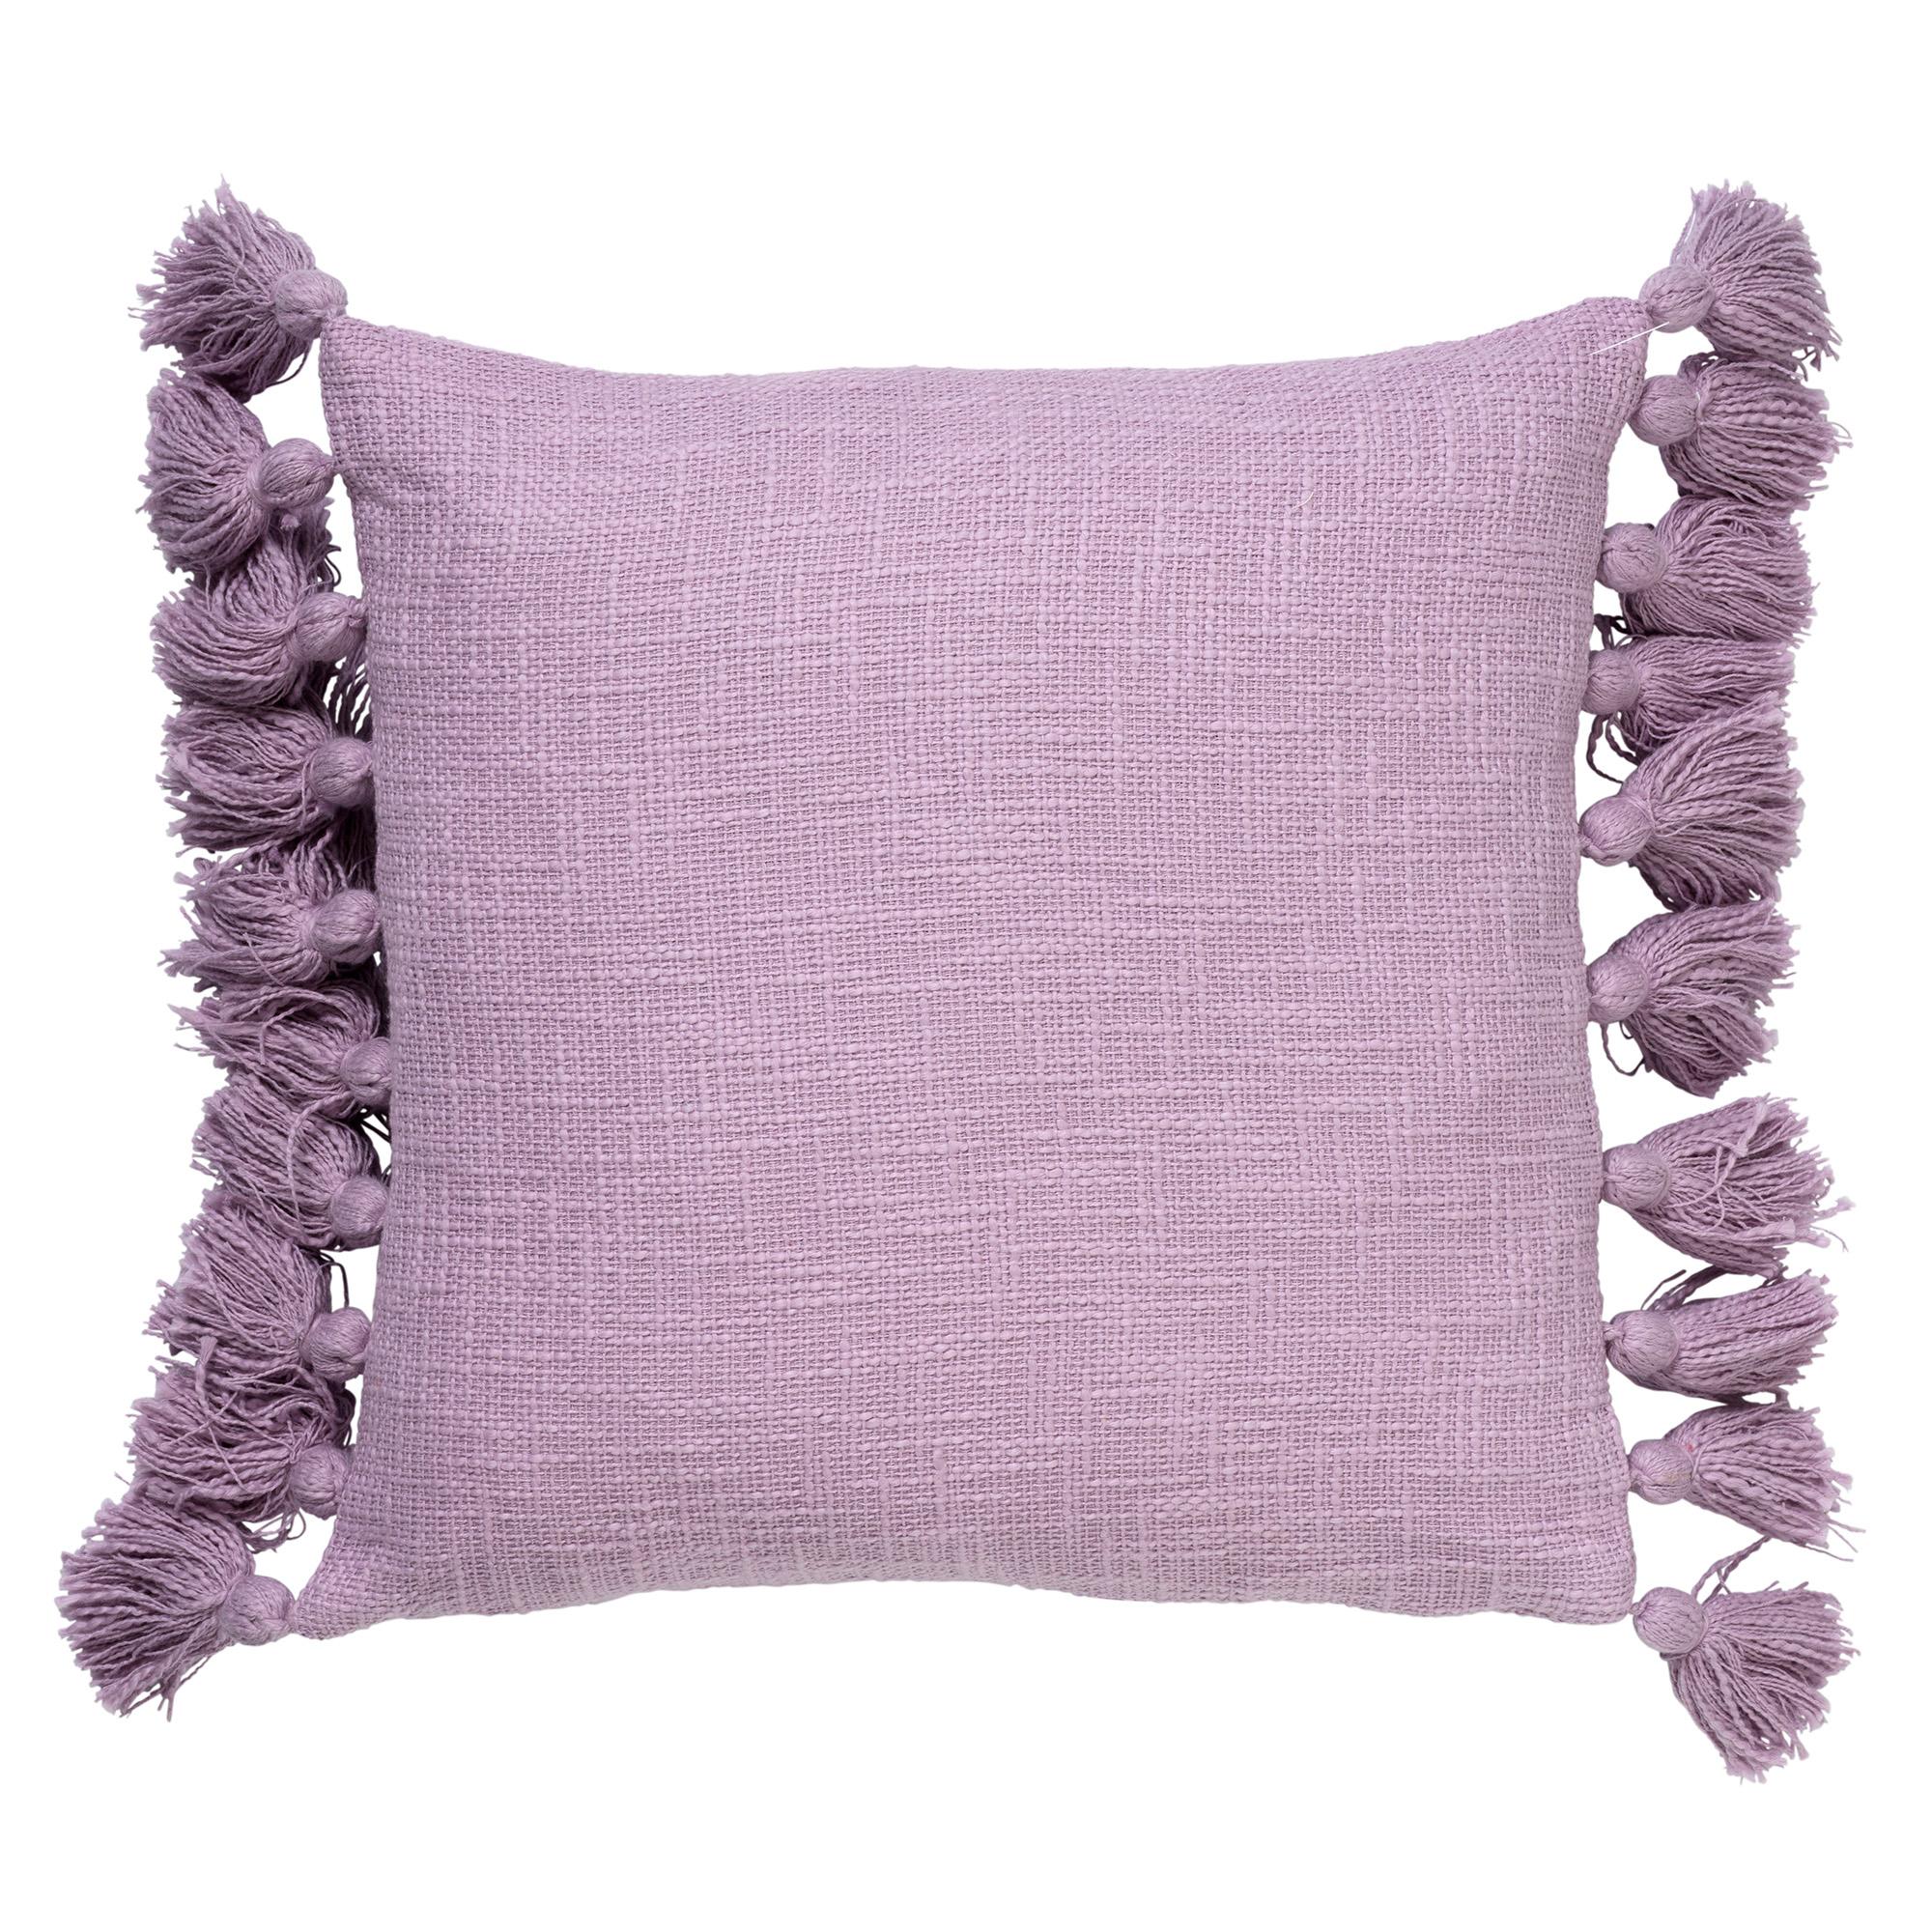 RUBY - Sierkussen van katoen Lavender Frost 45x45 cm